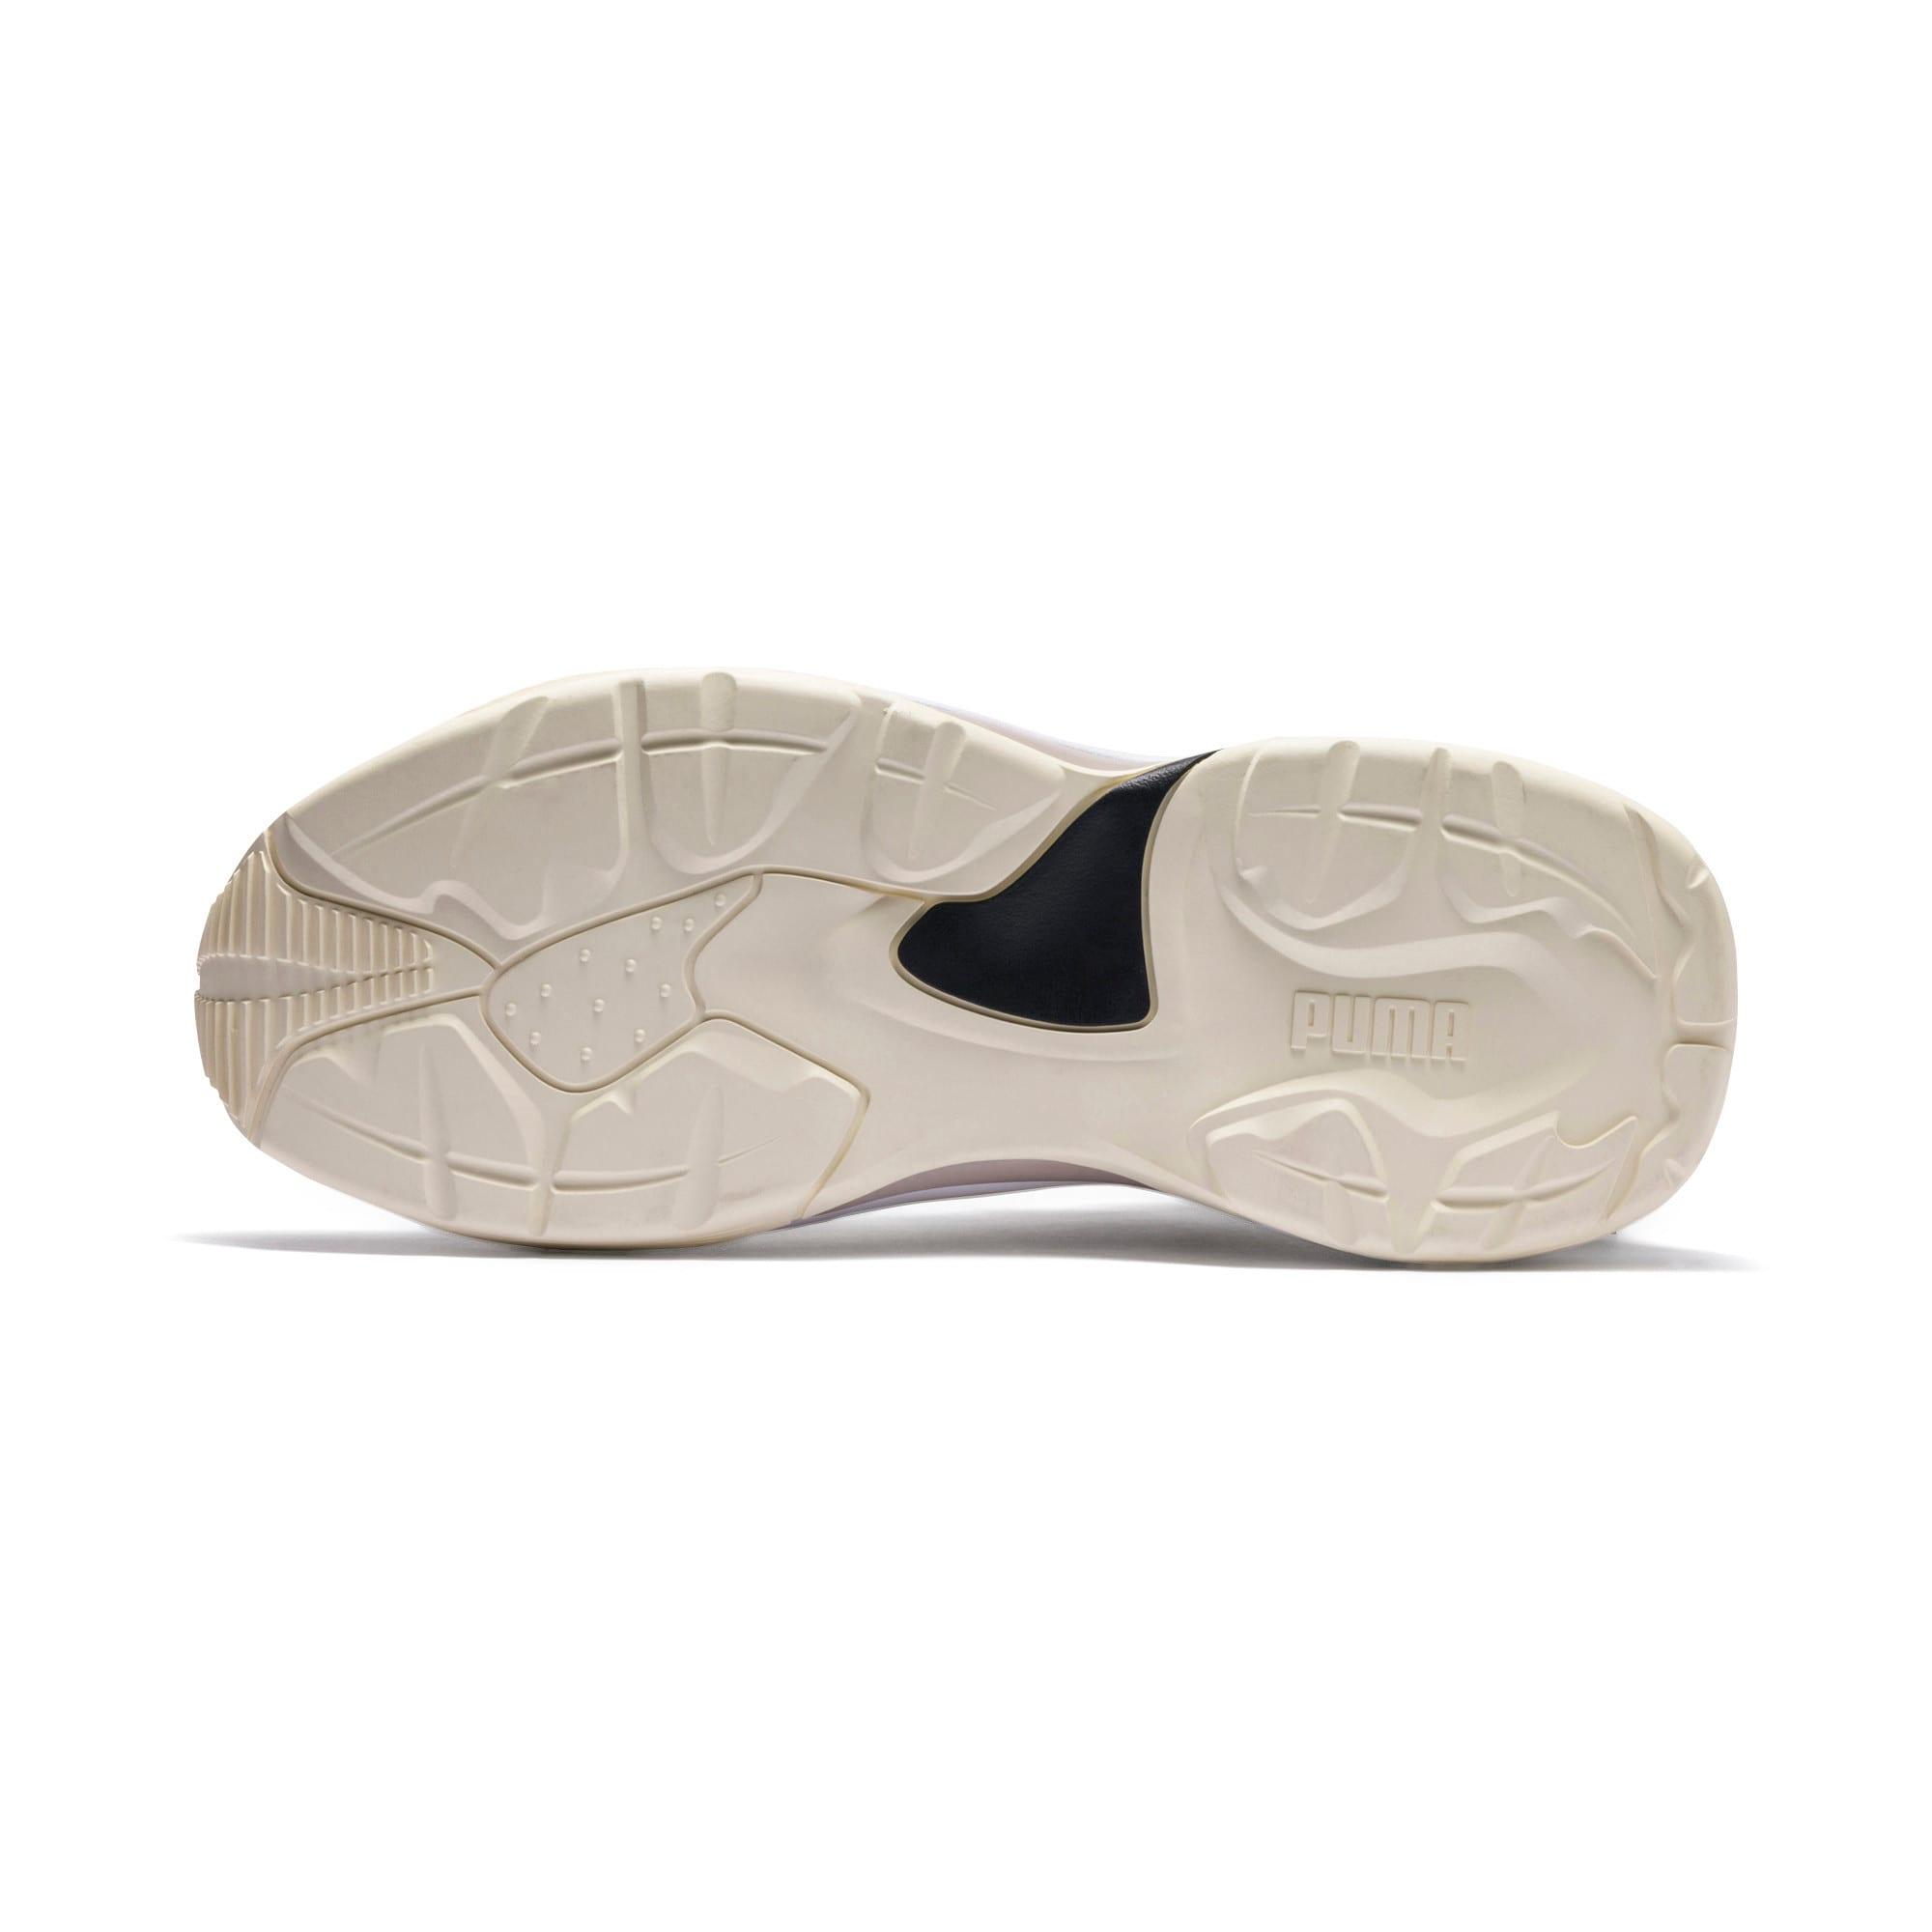 Thumbnail 4 of Thunder Nature Sneakers, S Gray-W White-Cloud Cream, medium